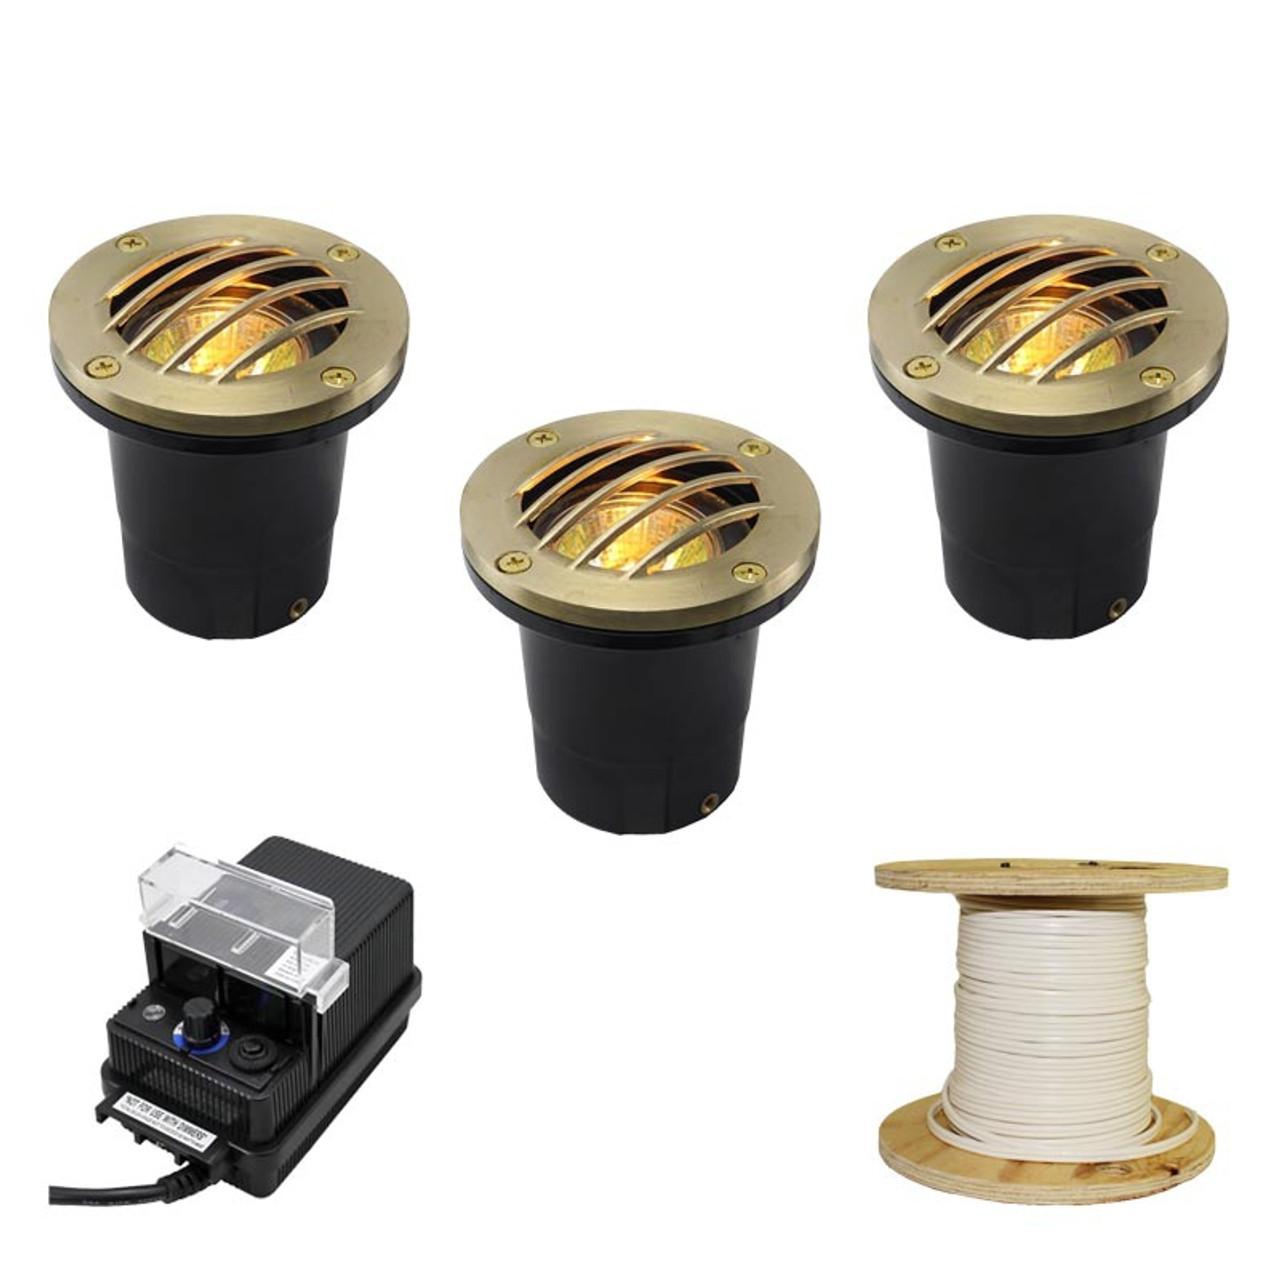 Outdoor DIY Lighting Kits  Affordable Quality Lighting